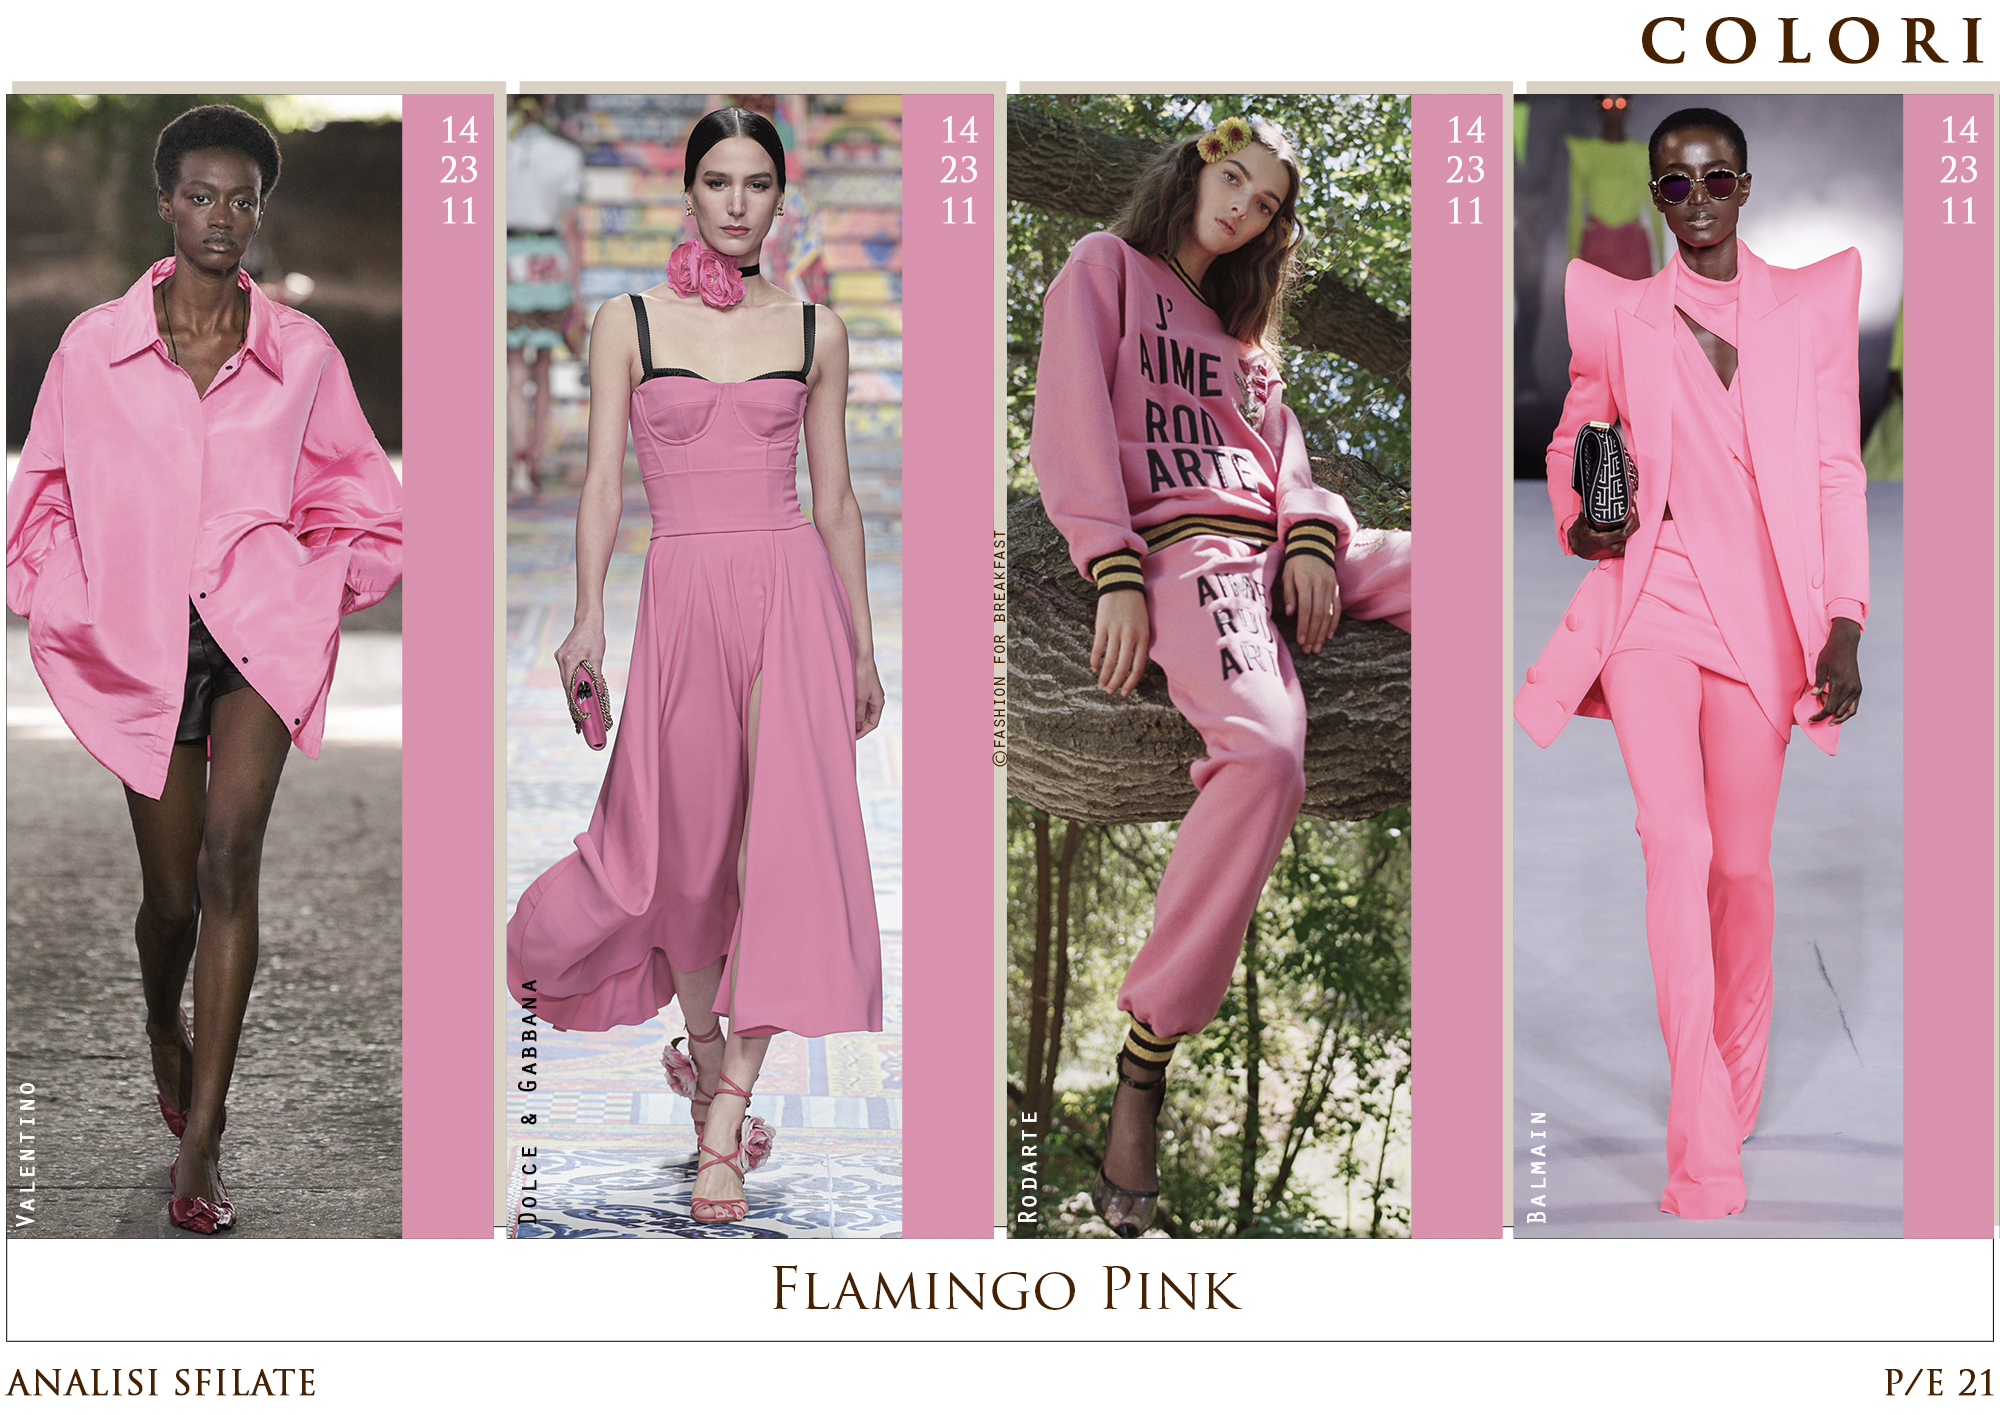 FLAMINGO PINK - Parigi chiude queste strane Fashion Week